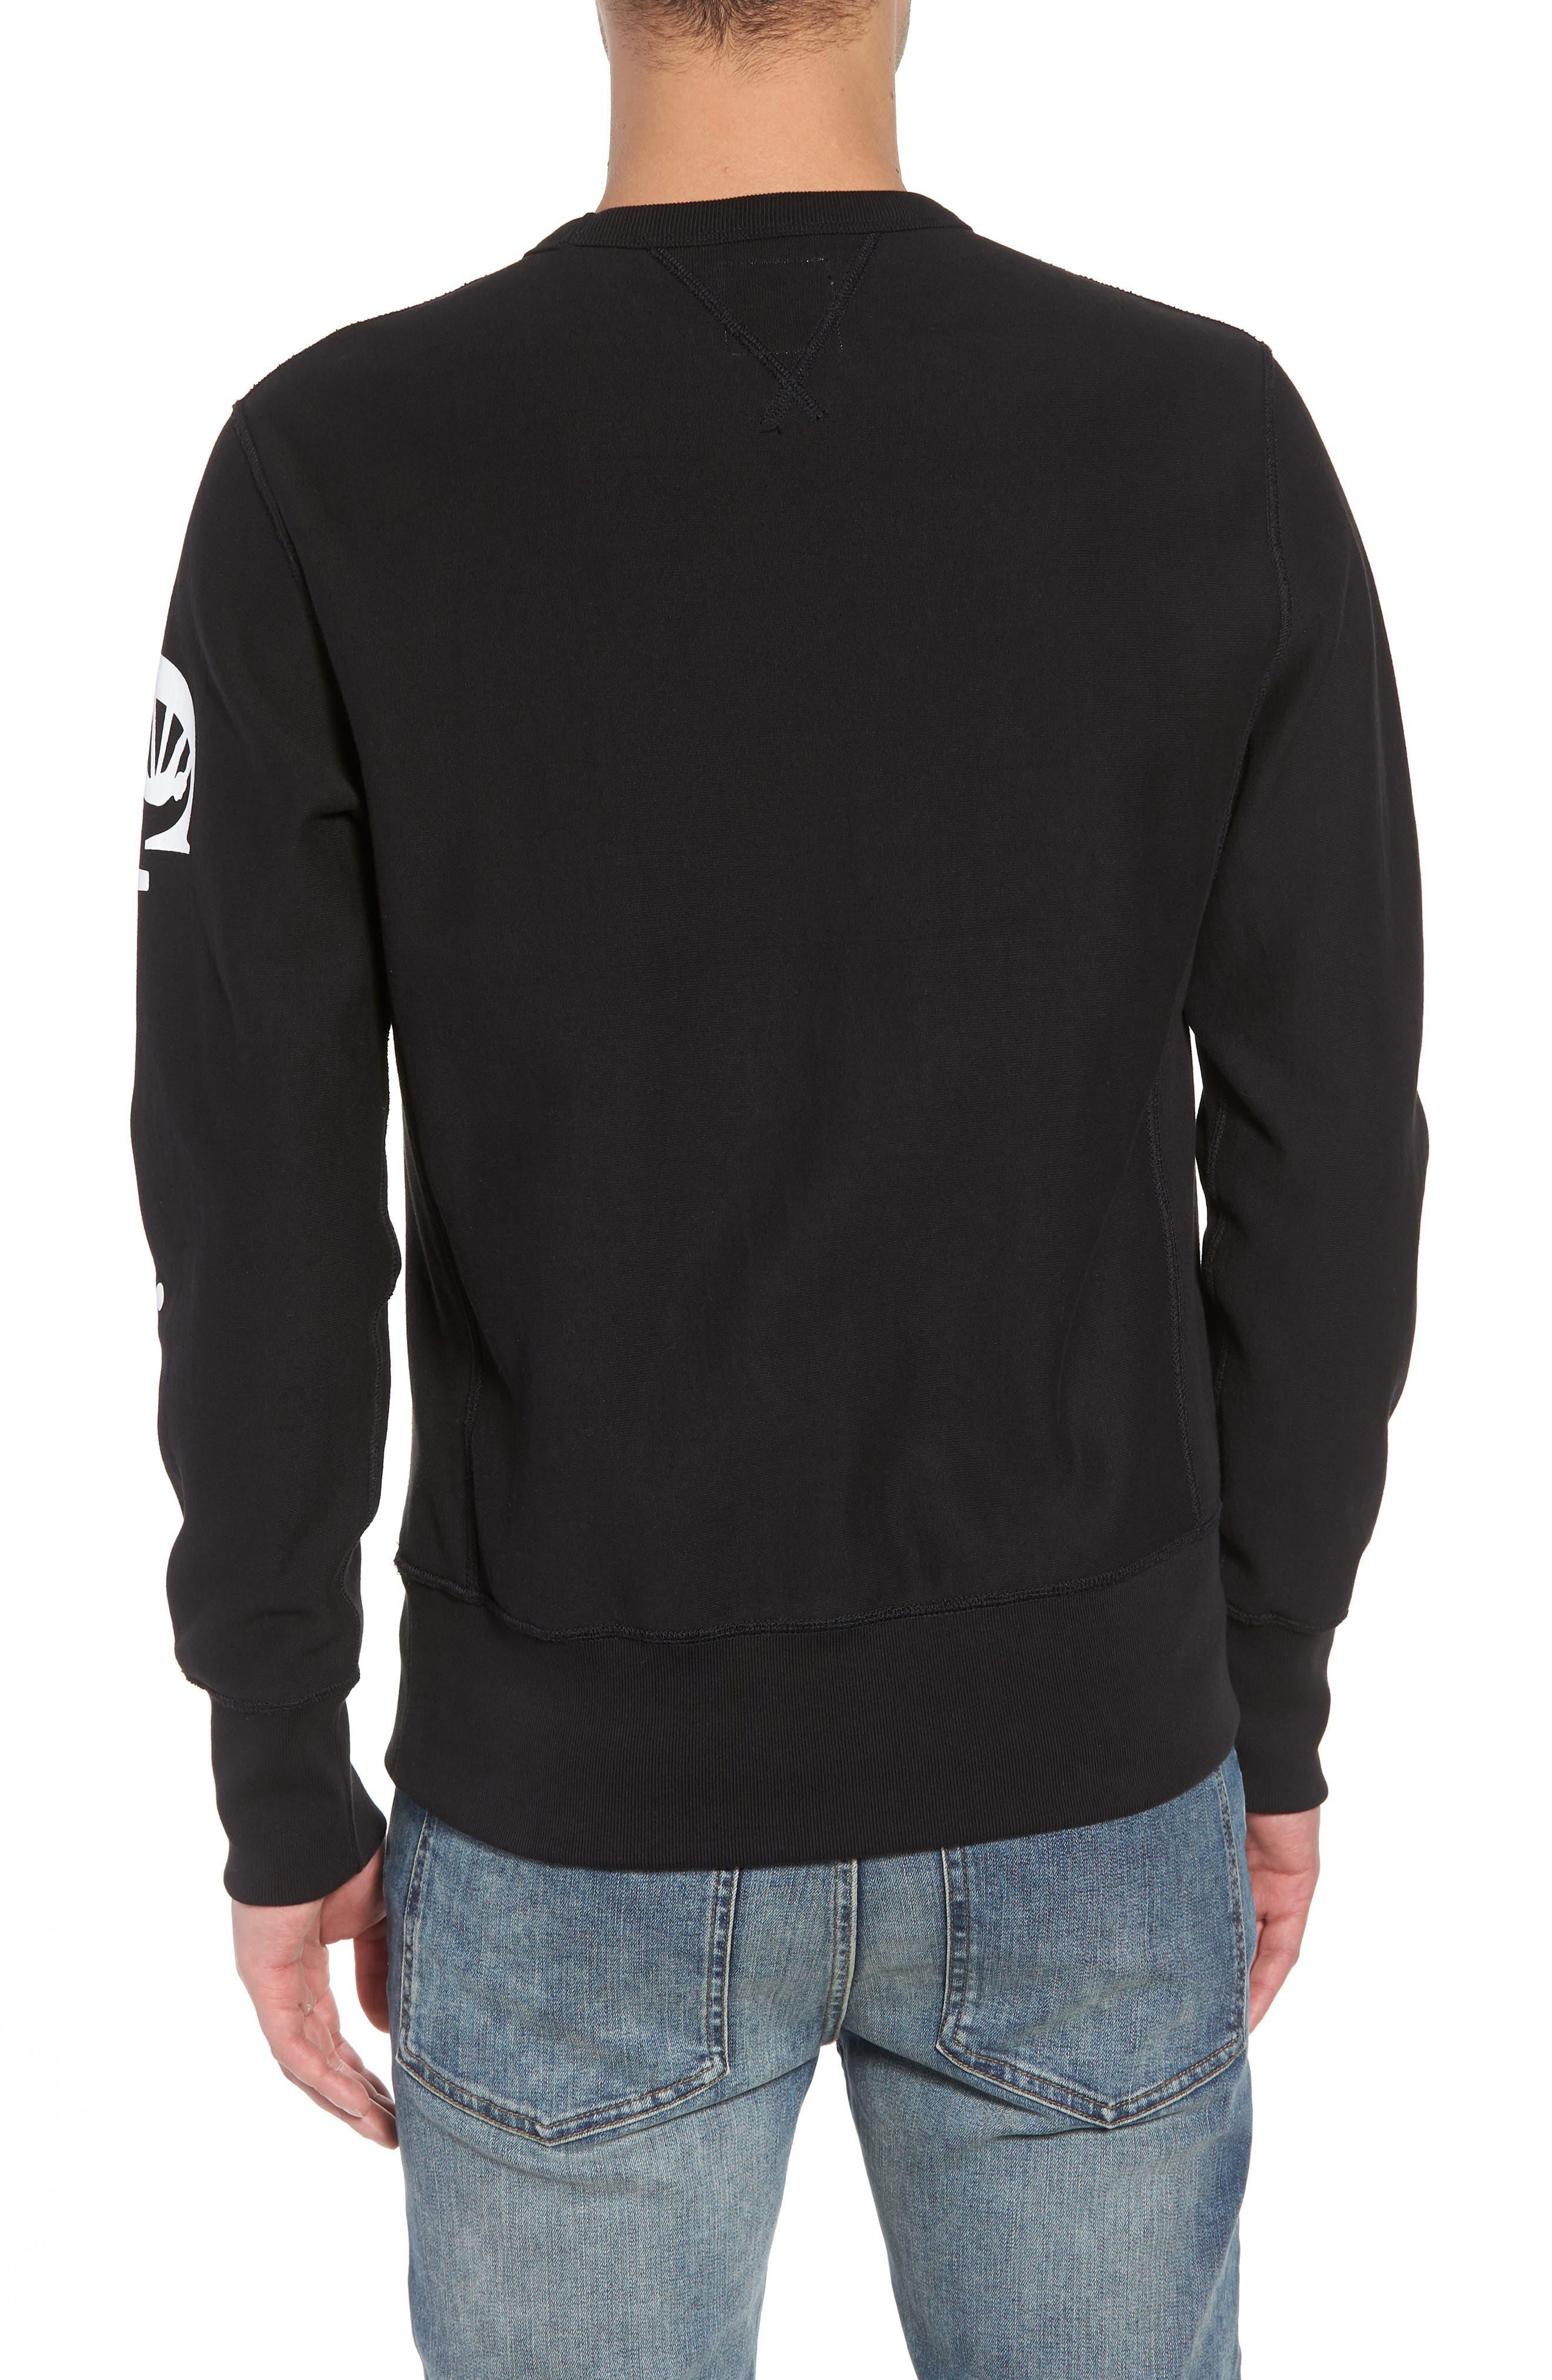 + Champion Graphic Sleeve Sweatshirt,                             Alternate thumbnail 2, color,                             001